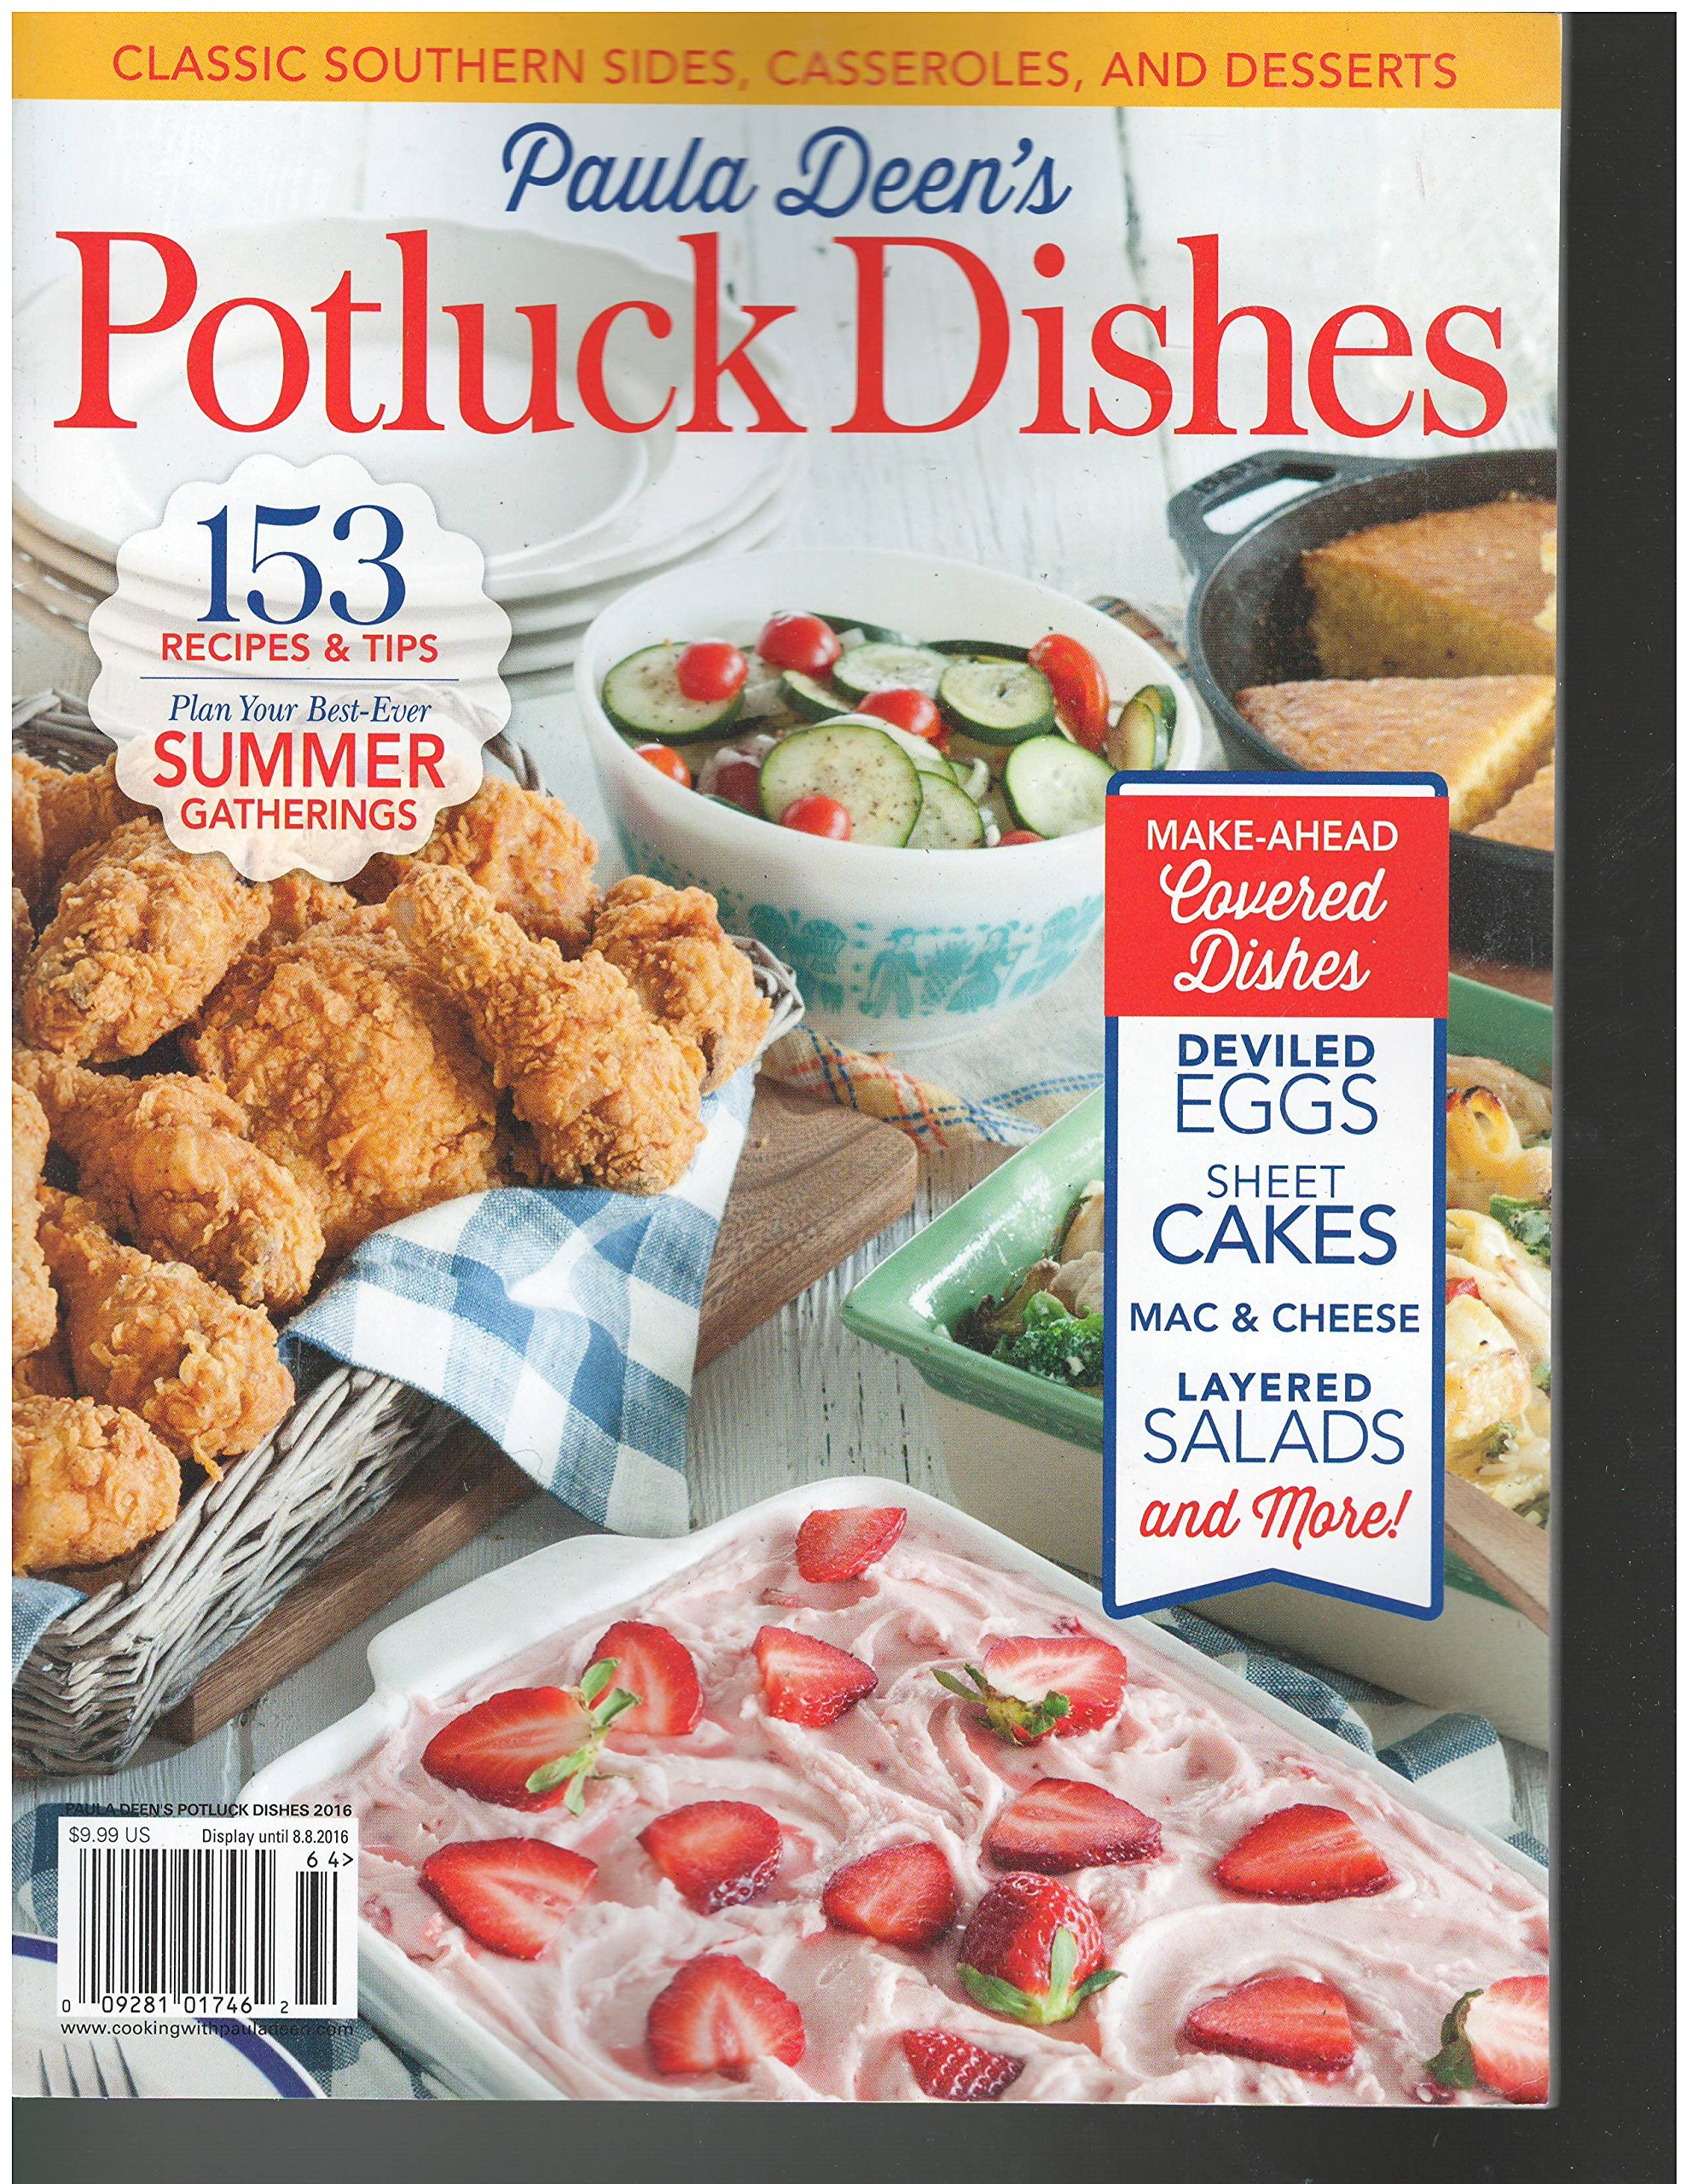 Paula Deen's Potluck Dishes Magazine 2016 ebook